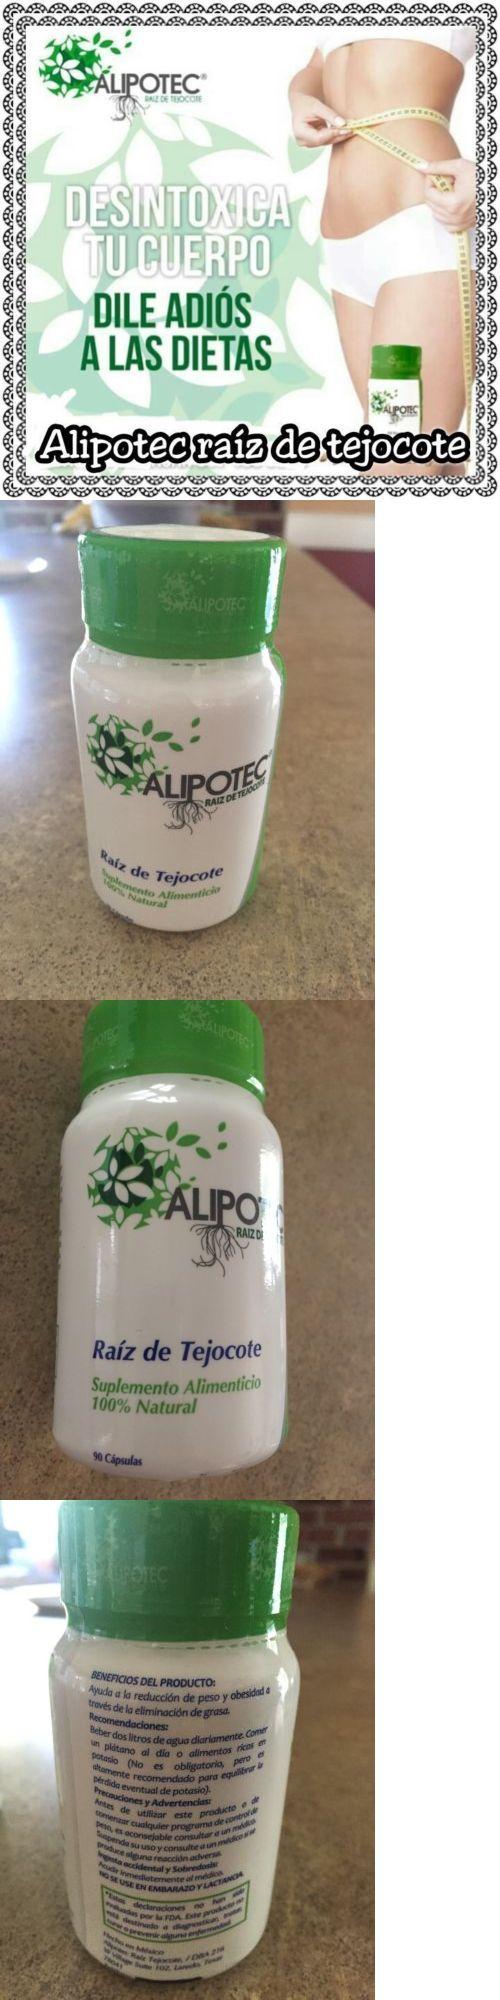 Other Weight Management: Original Alipotec Capsulas Raíz De Tejocote+Espirulina+Fibra (90U) Baje De Peso -> BUY IT NOW ONLY: $52.75 on eBay!